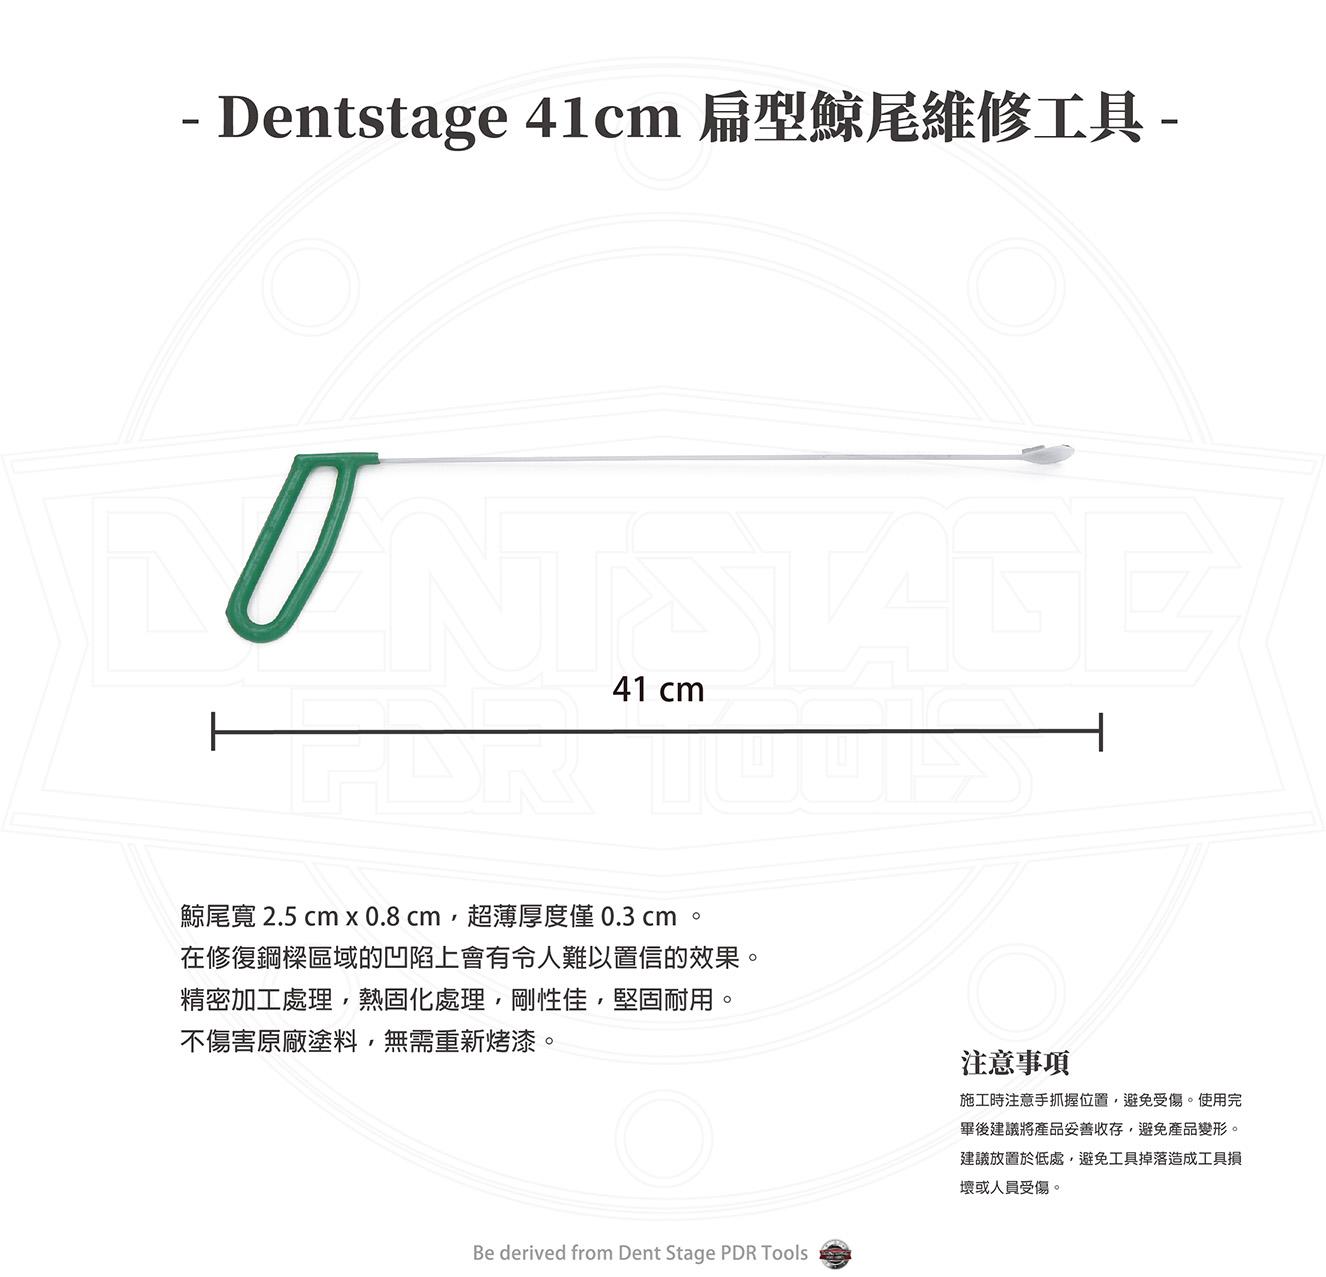 Dentstage 41cm 扁型鯨尾維修工具_02.jpg